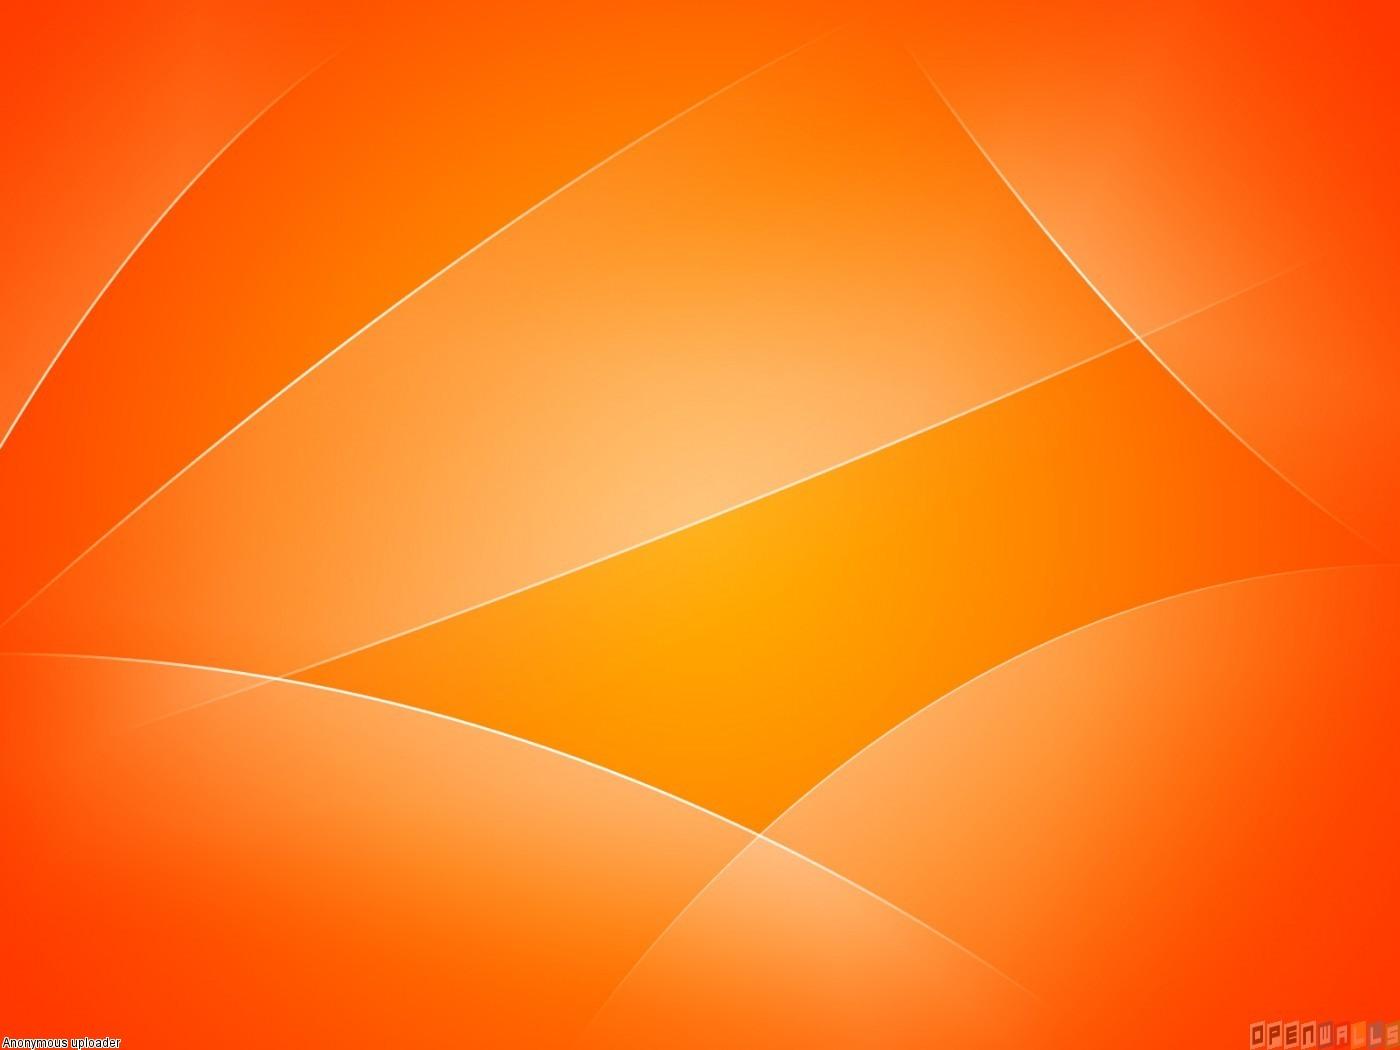 Orange background wallpaper 12889   Open Walls 1400x1050